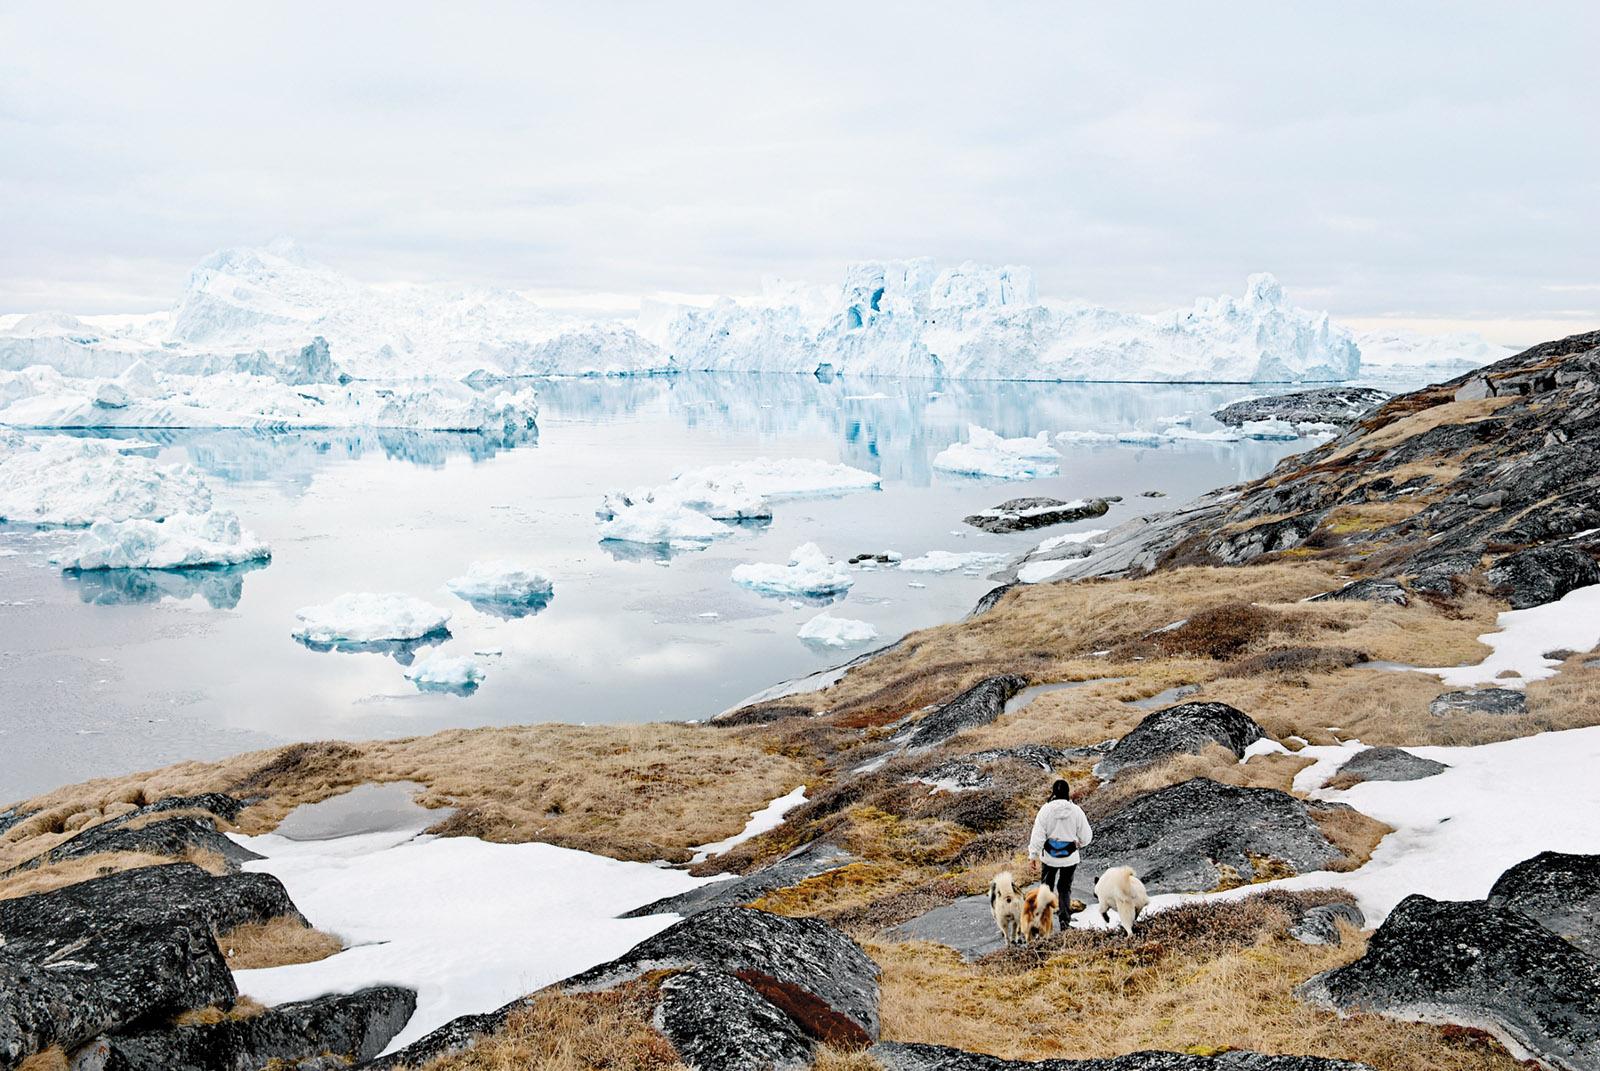 Icebergs off the coast of Ilulissat, Greenland, 2007